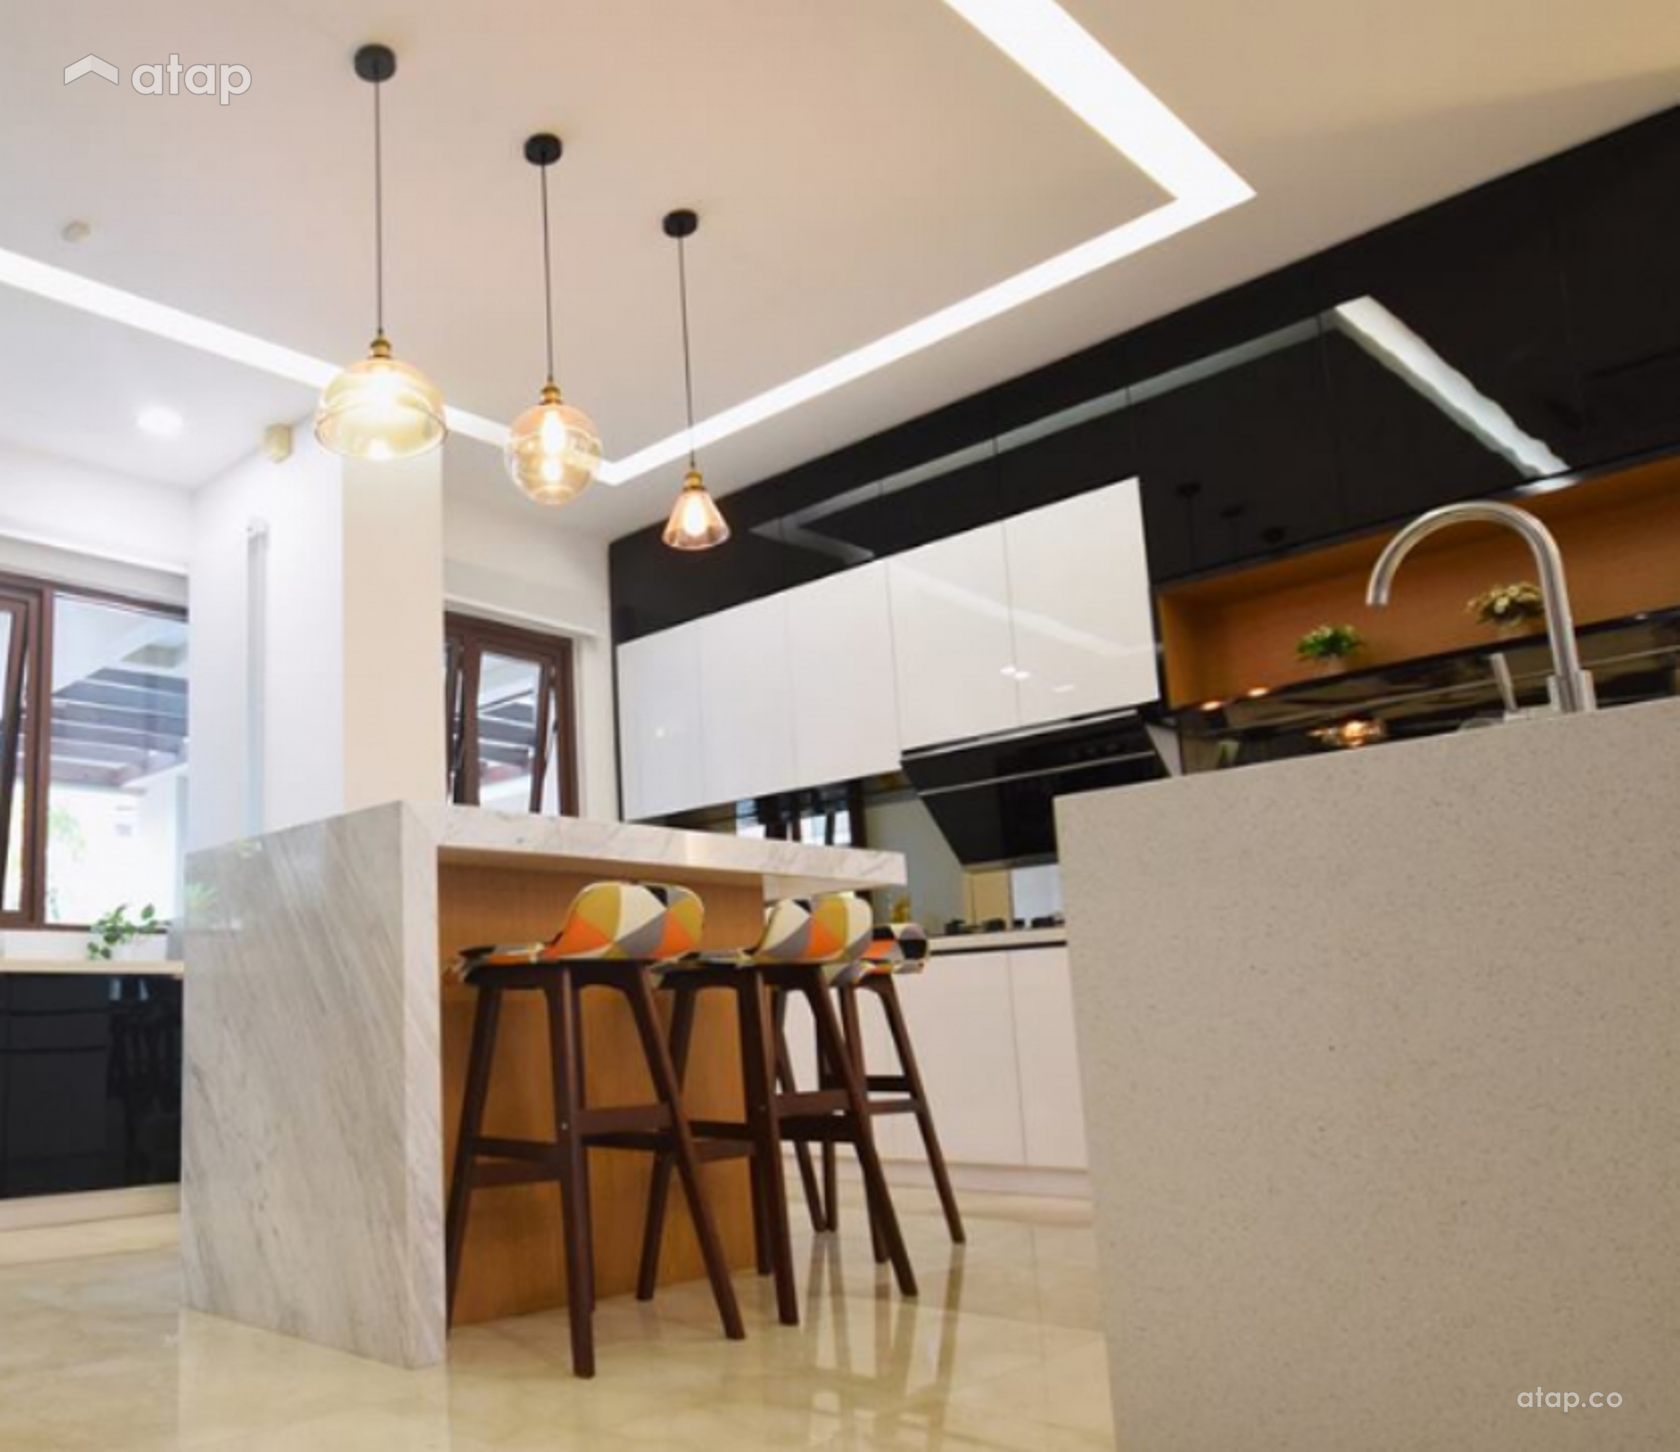 Contemporary Modern Kitchen Semi Detached Design Ideas: Contemporary Modern Dining Room Kitchen Semi-detached